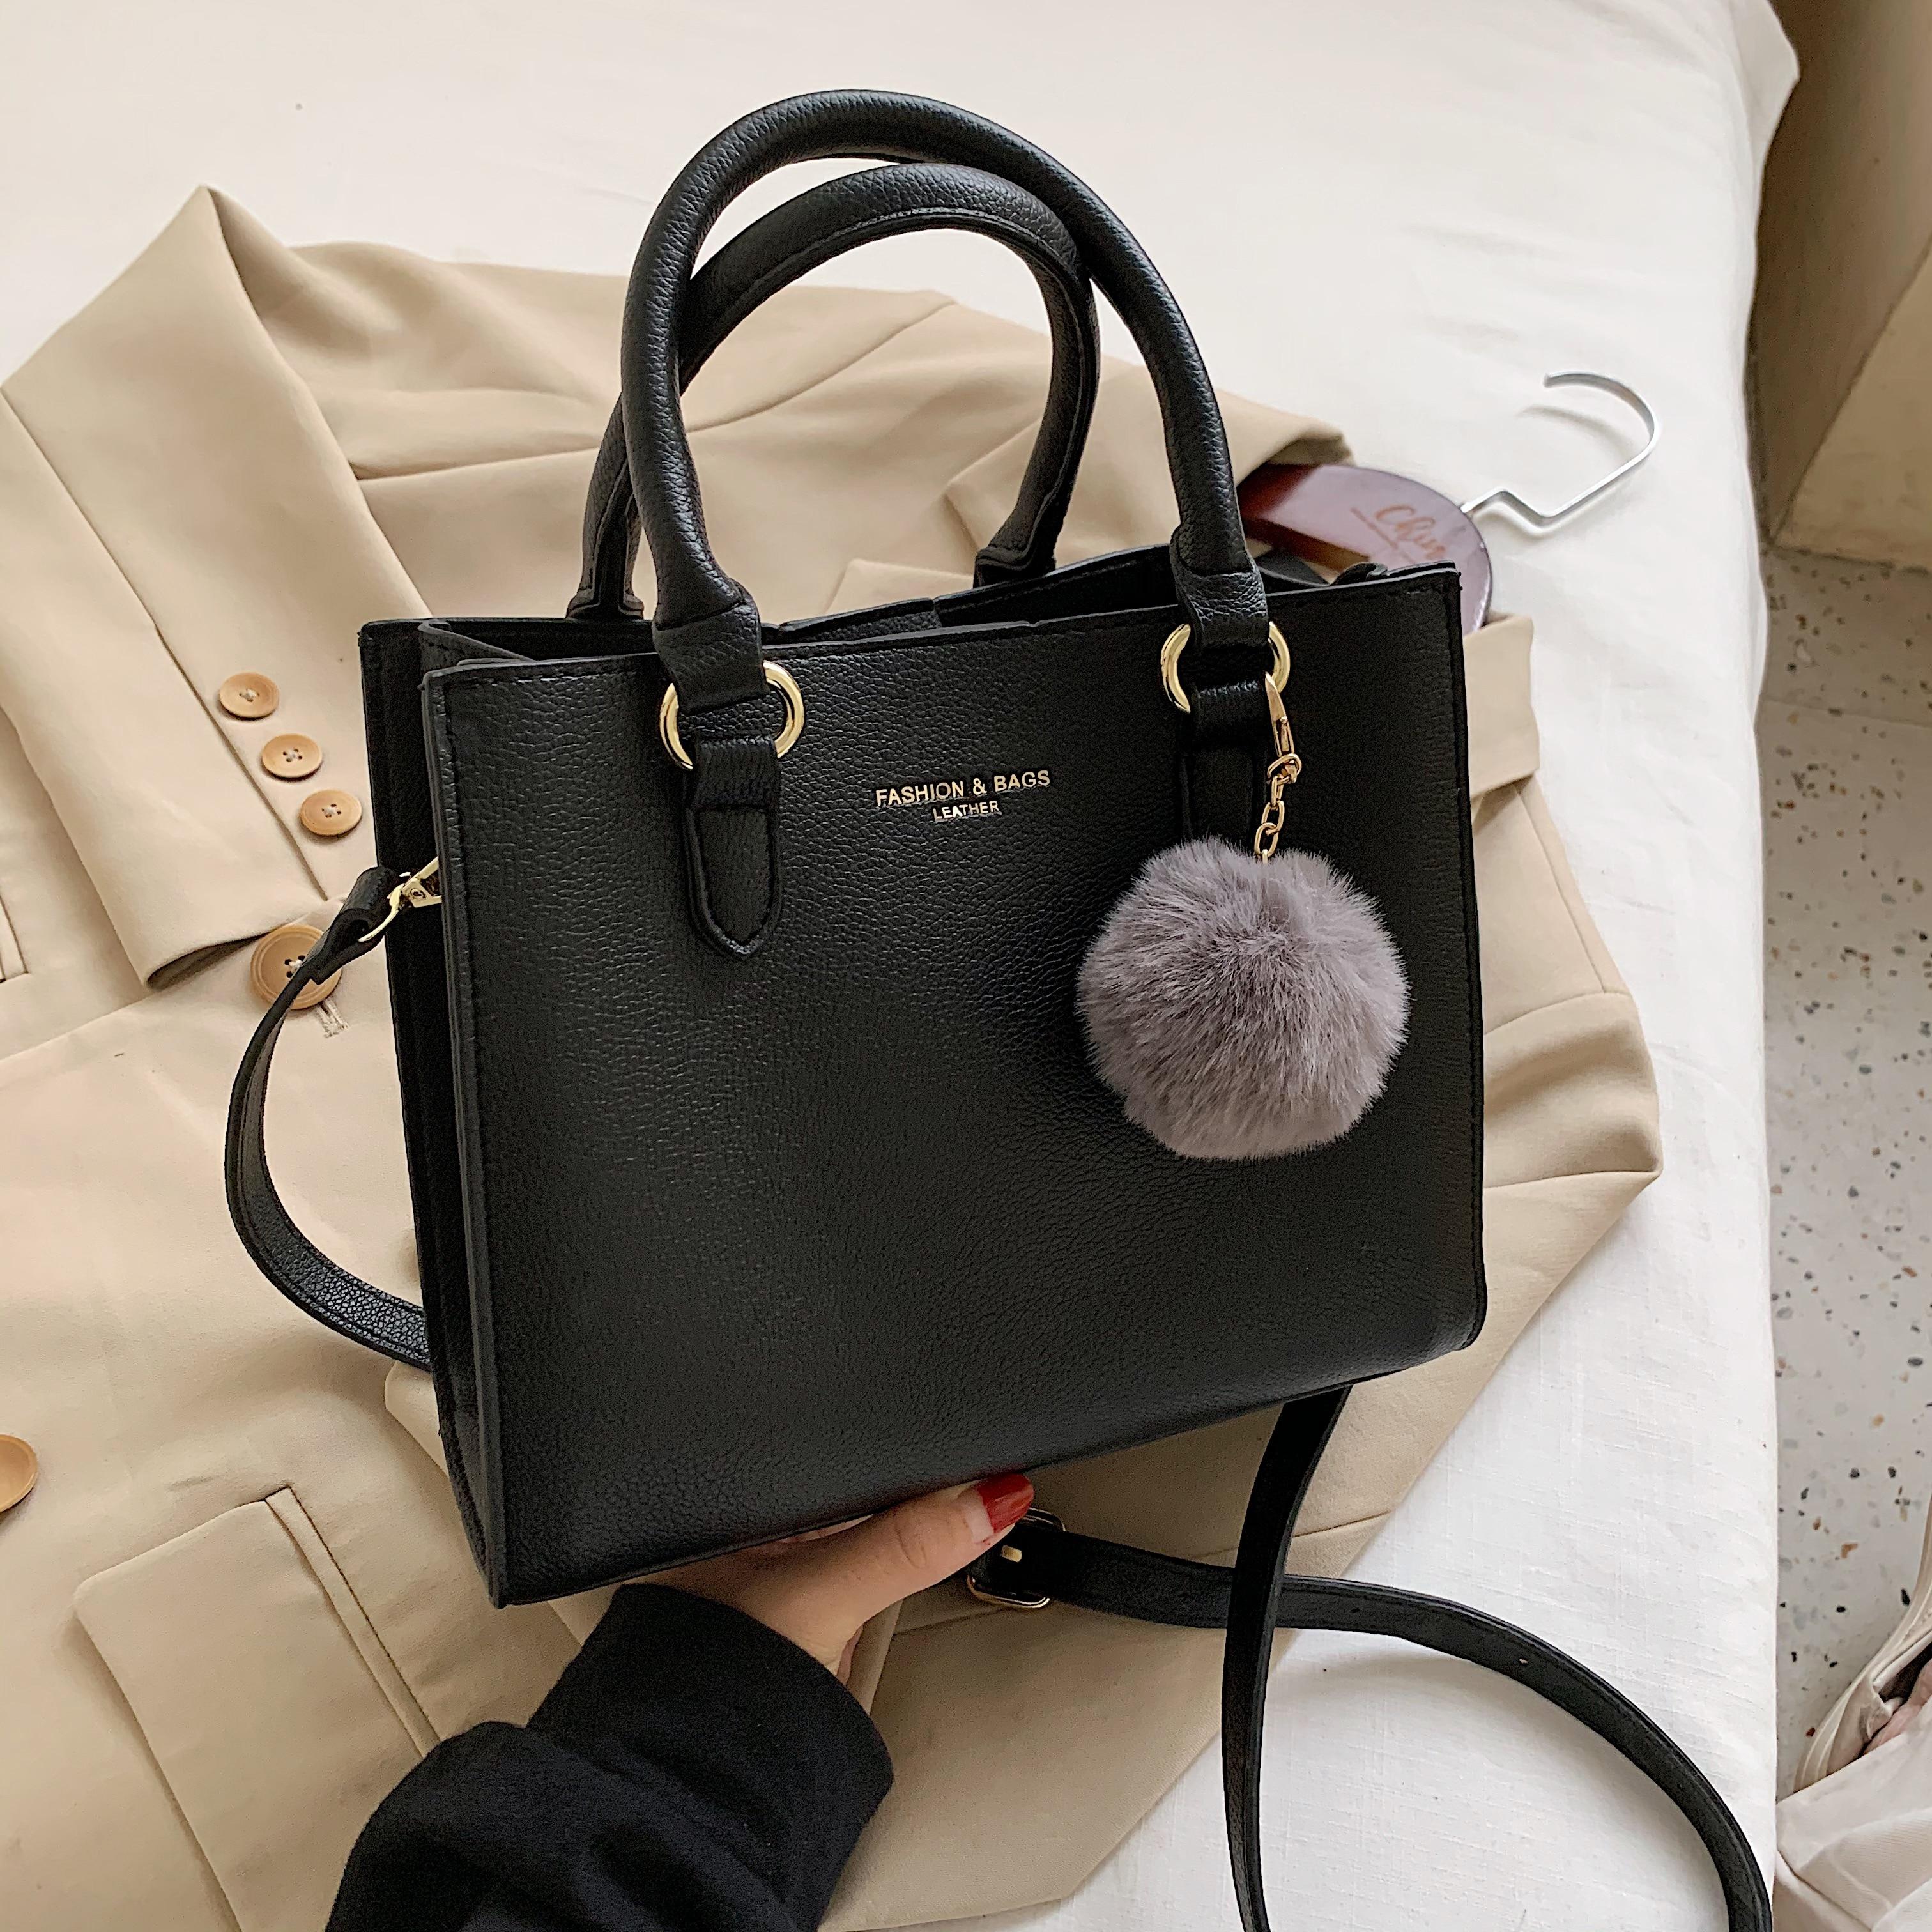 2021 New Luxury Handbag Women Stitching Wild Messenger Bags Designer Brand Plaid Shoulder Bag Female Ladies Totes Crossbody Bags